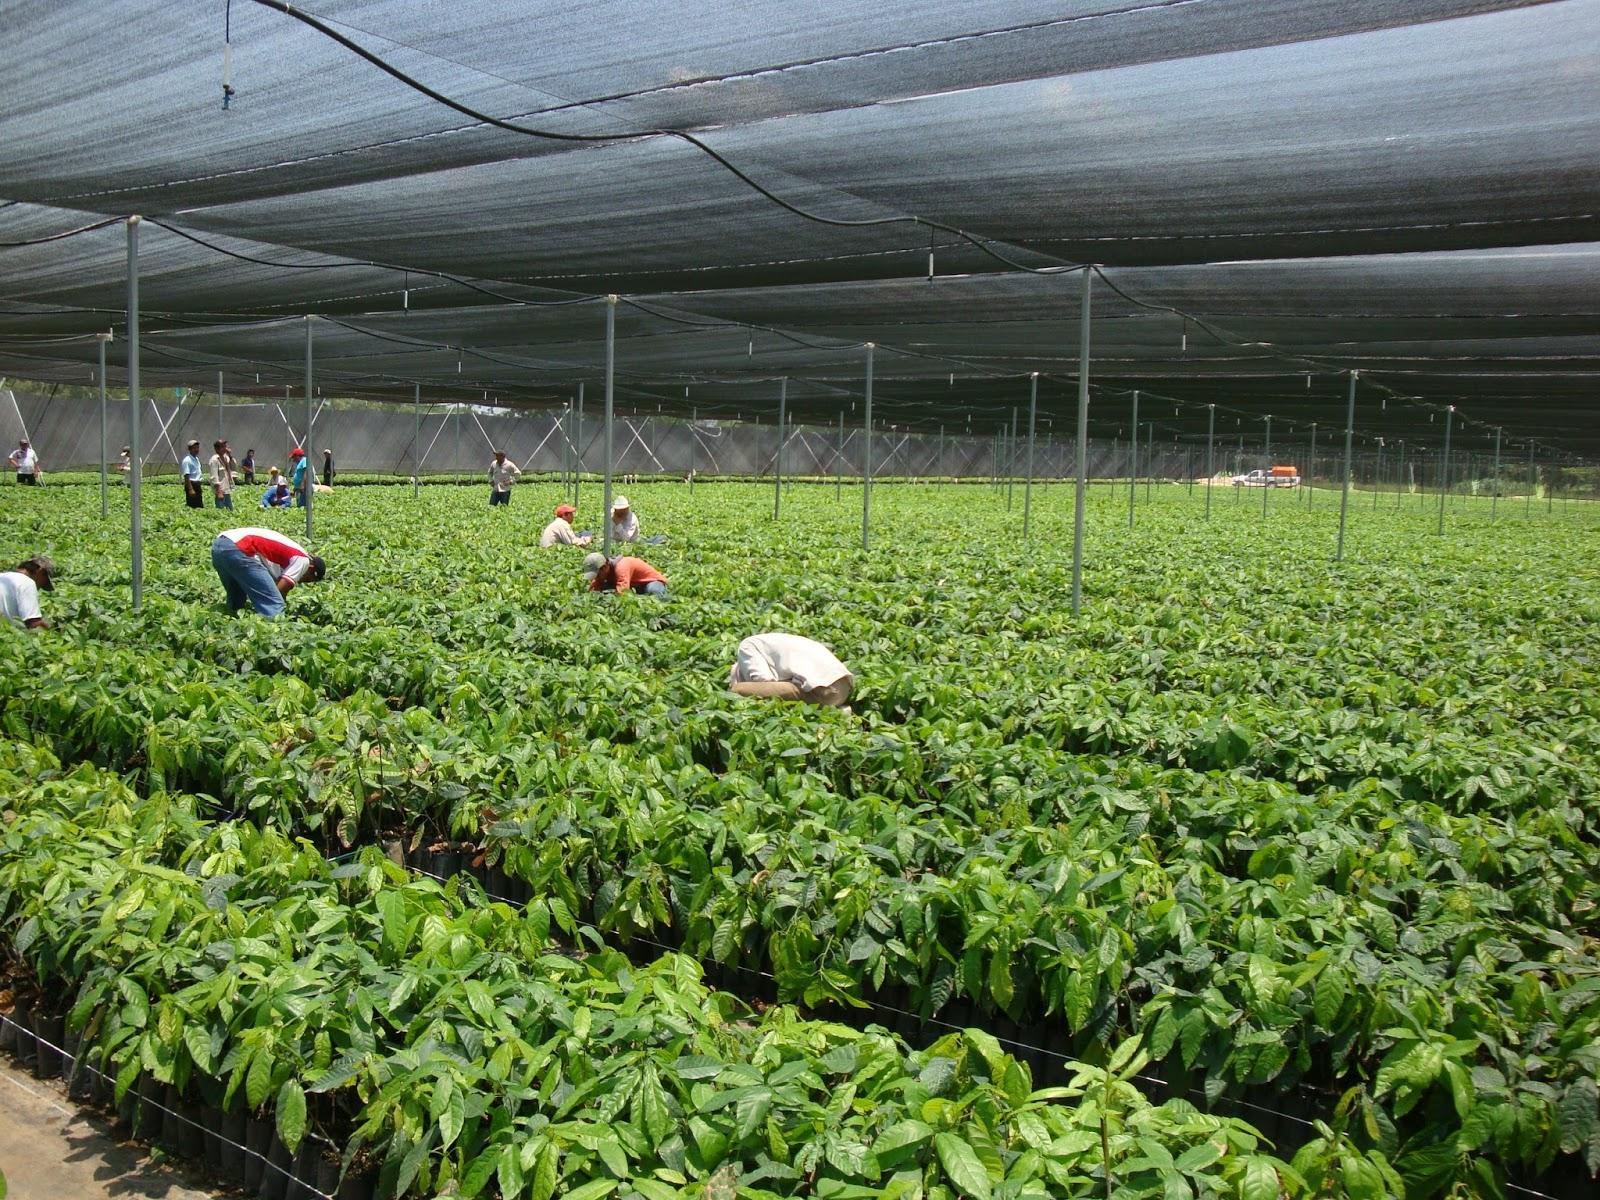 Invernaderos for Plantas para invernadero